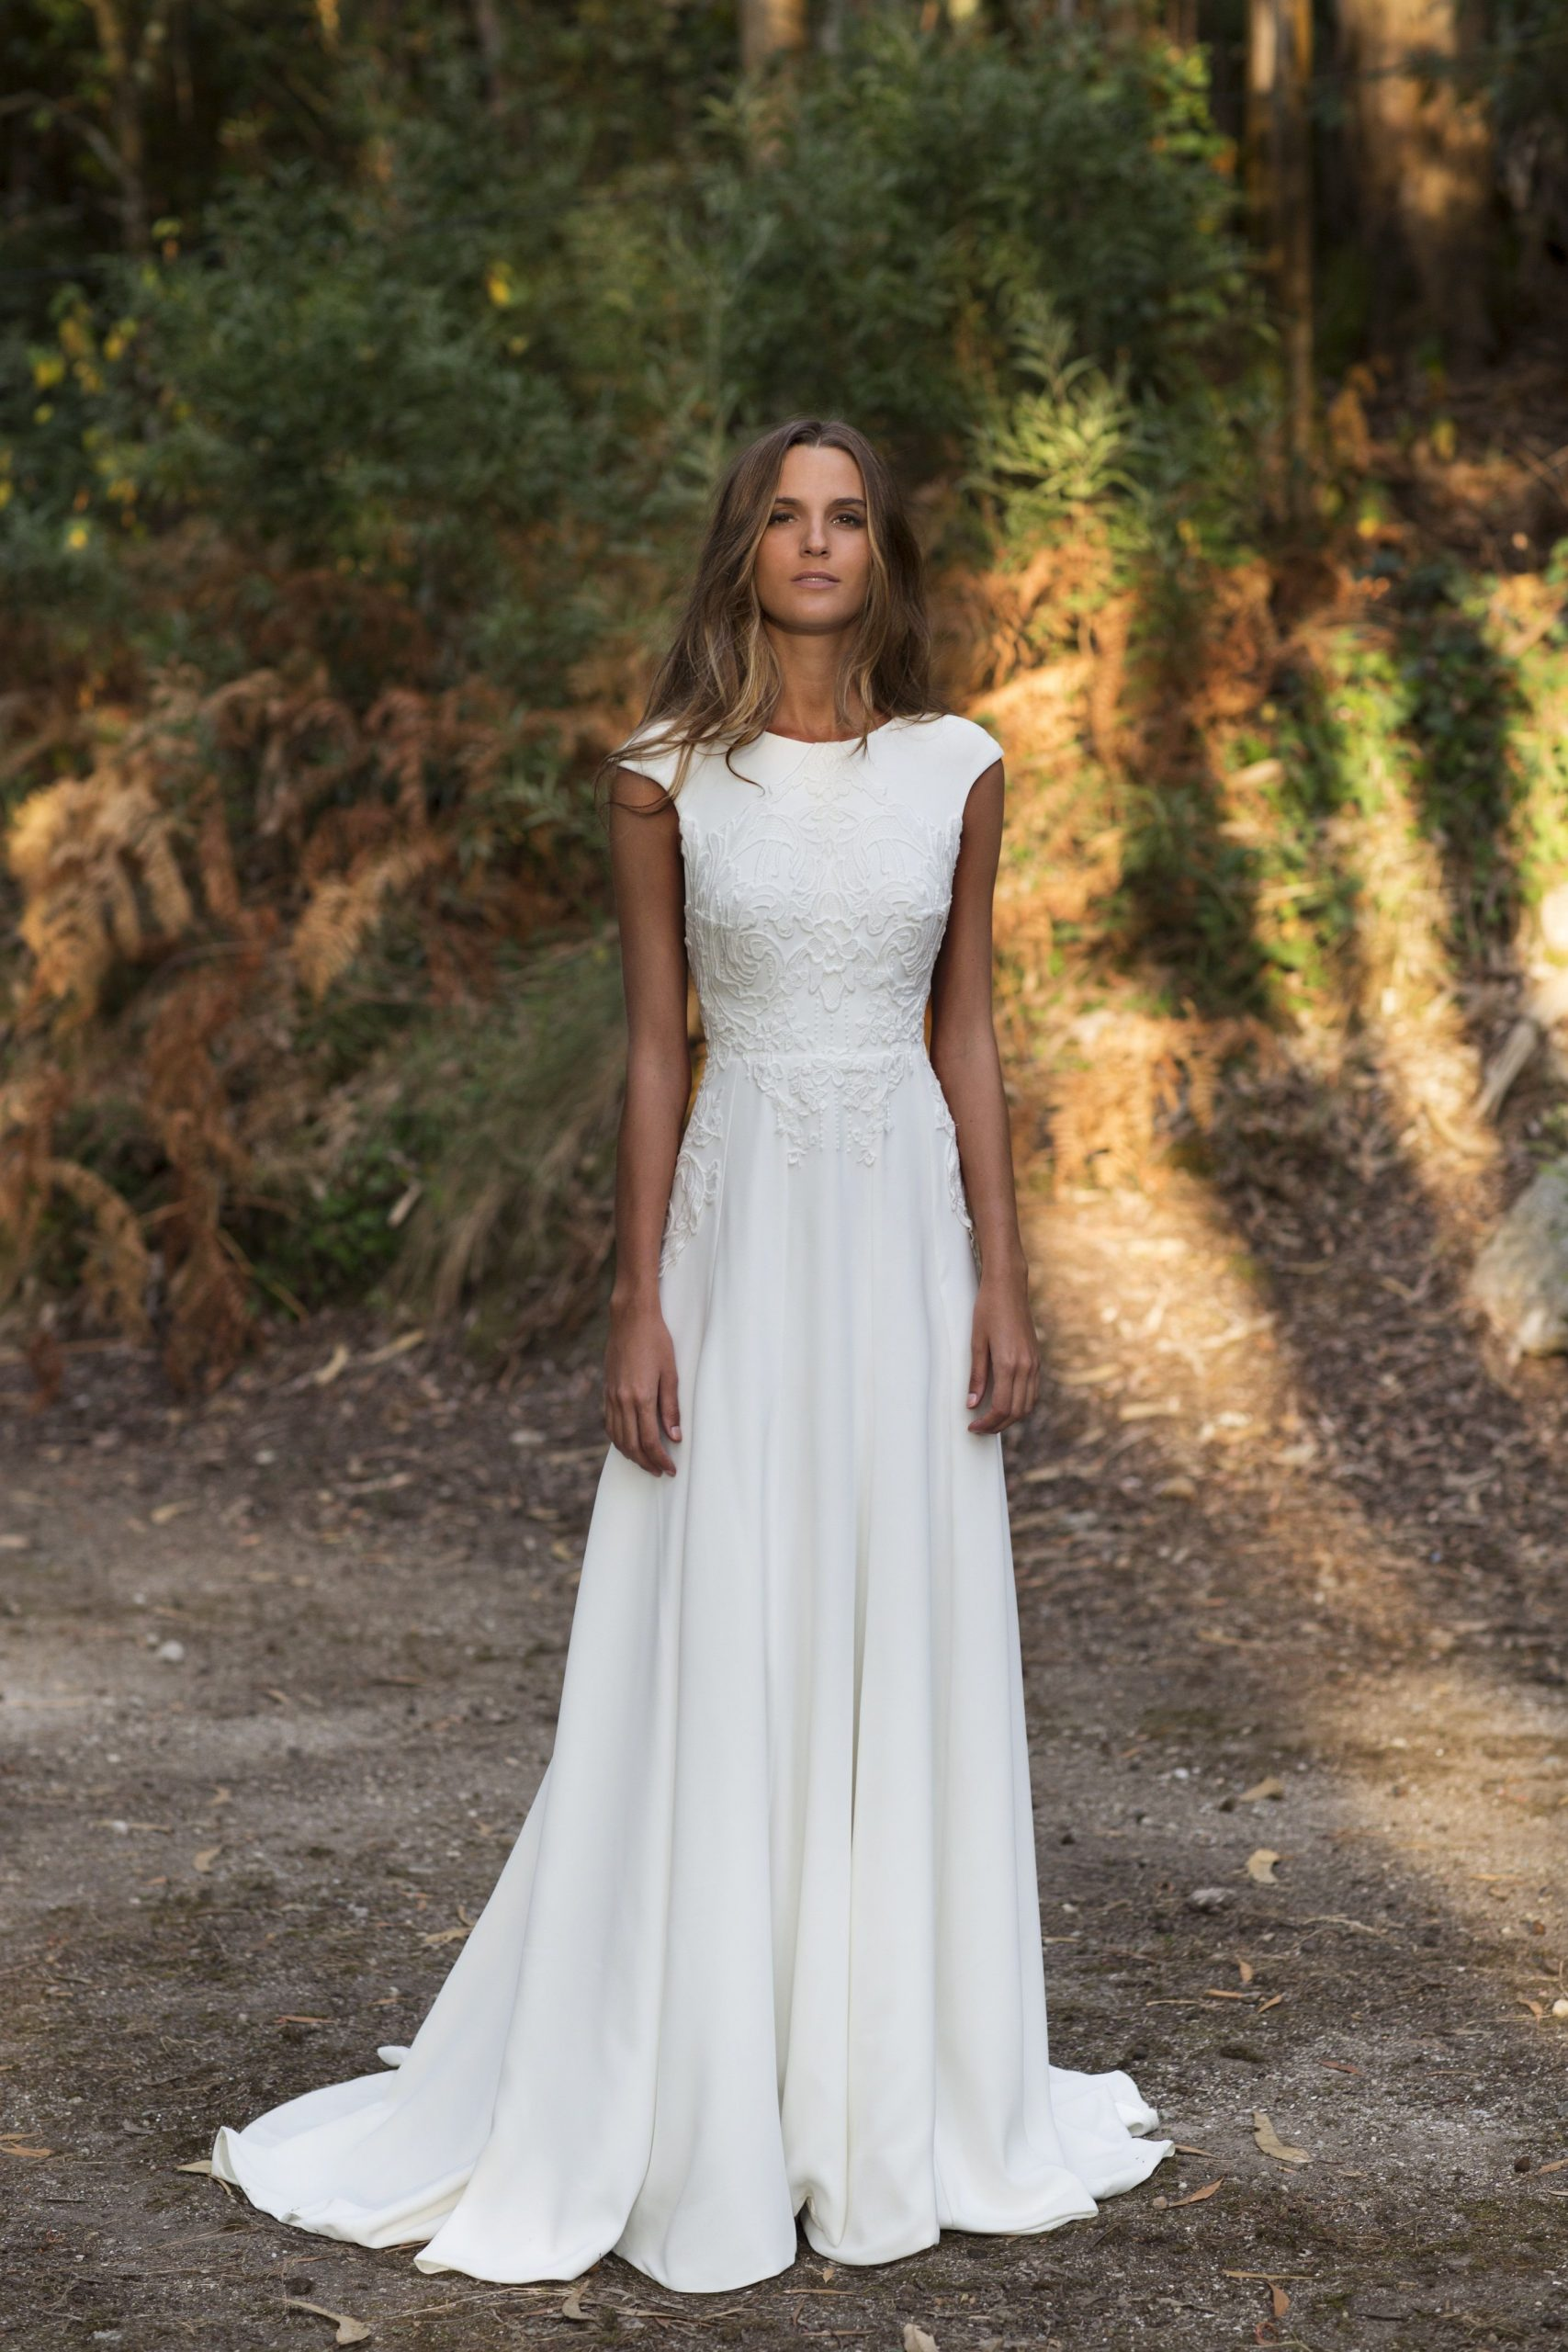 Vestido De Novia La Toja | Kleid Hochzeit, Hochzeit Kleidung